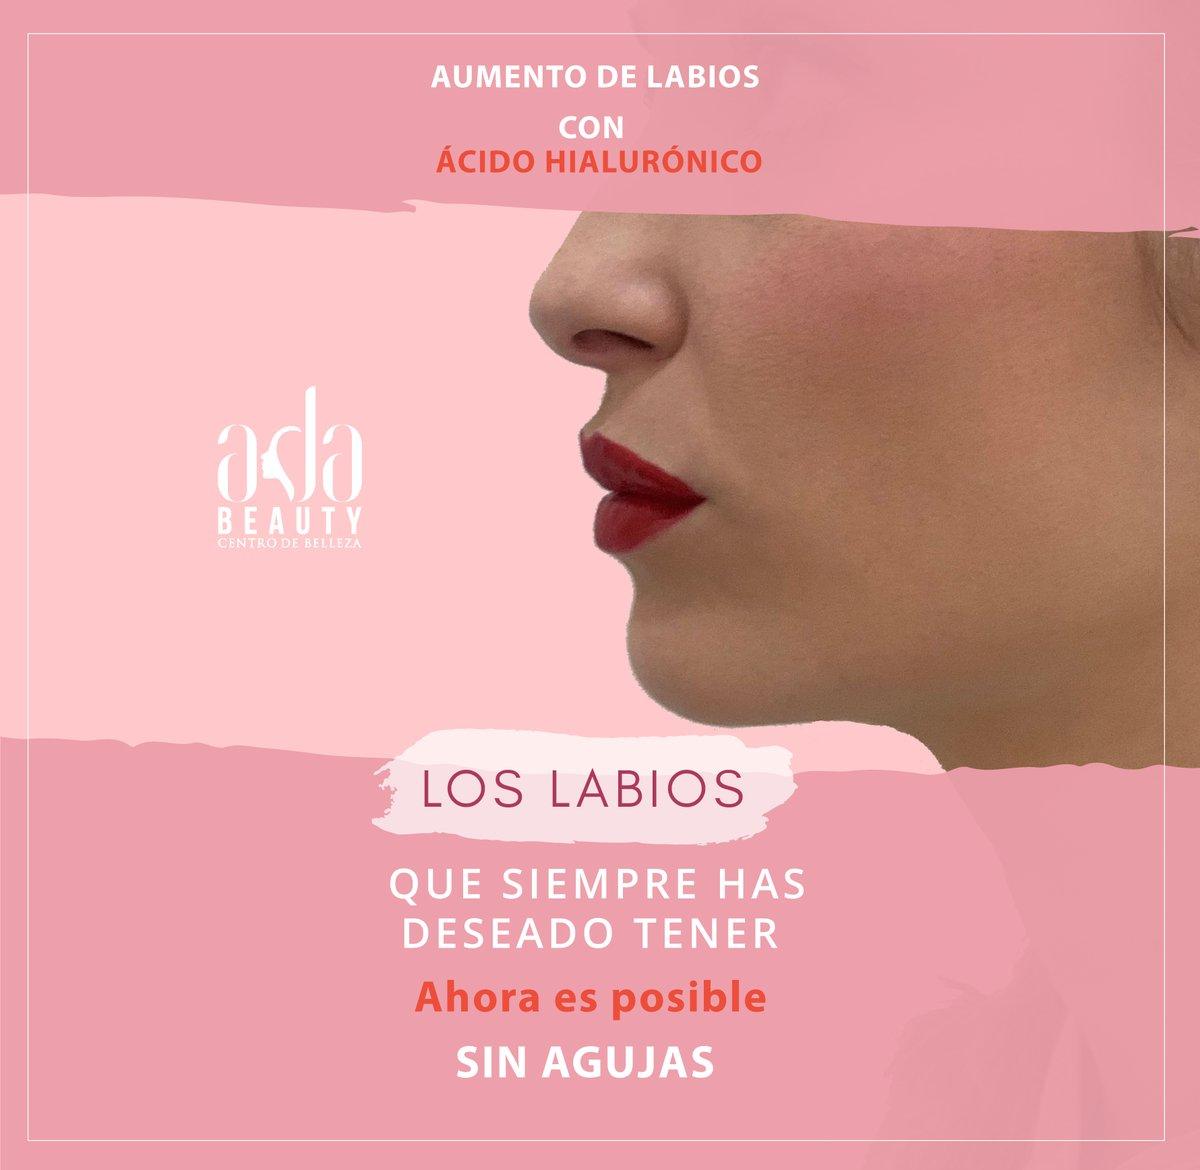 #centrodeestetica #elche #centrodeesteticaintegral #belleza #bellezaysalud #beauty #labioscarnosos #labiosperfectos #labios💋 #HIALURONPEN #aumentodelabios #sinagujas